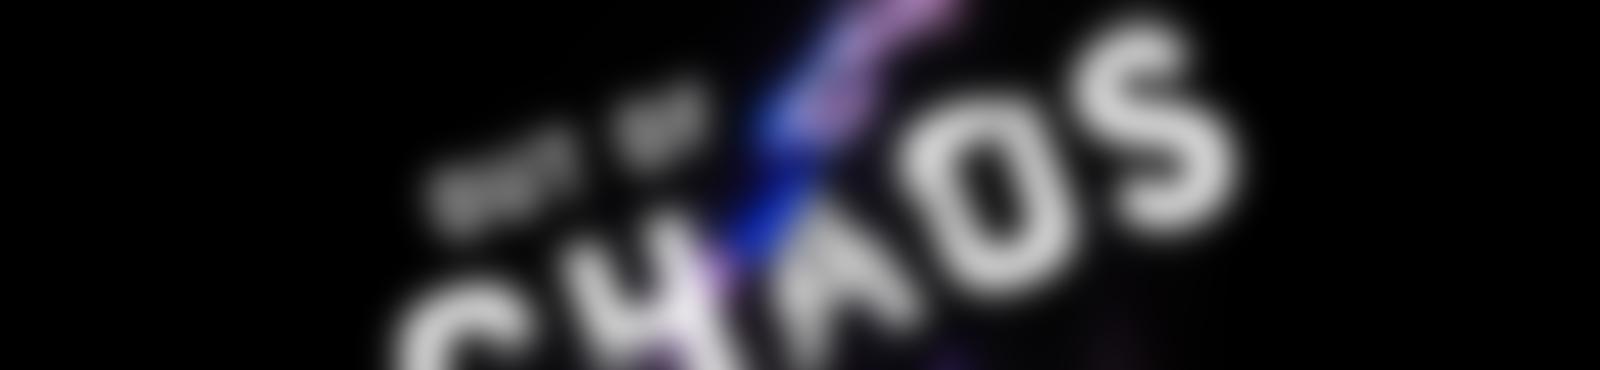 Blurred 20dfd299 ac9b 4782 ae48 7c254a6ca960